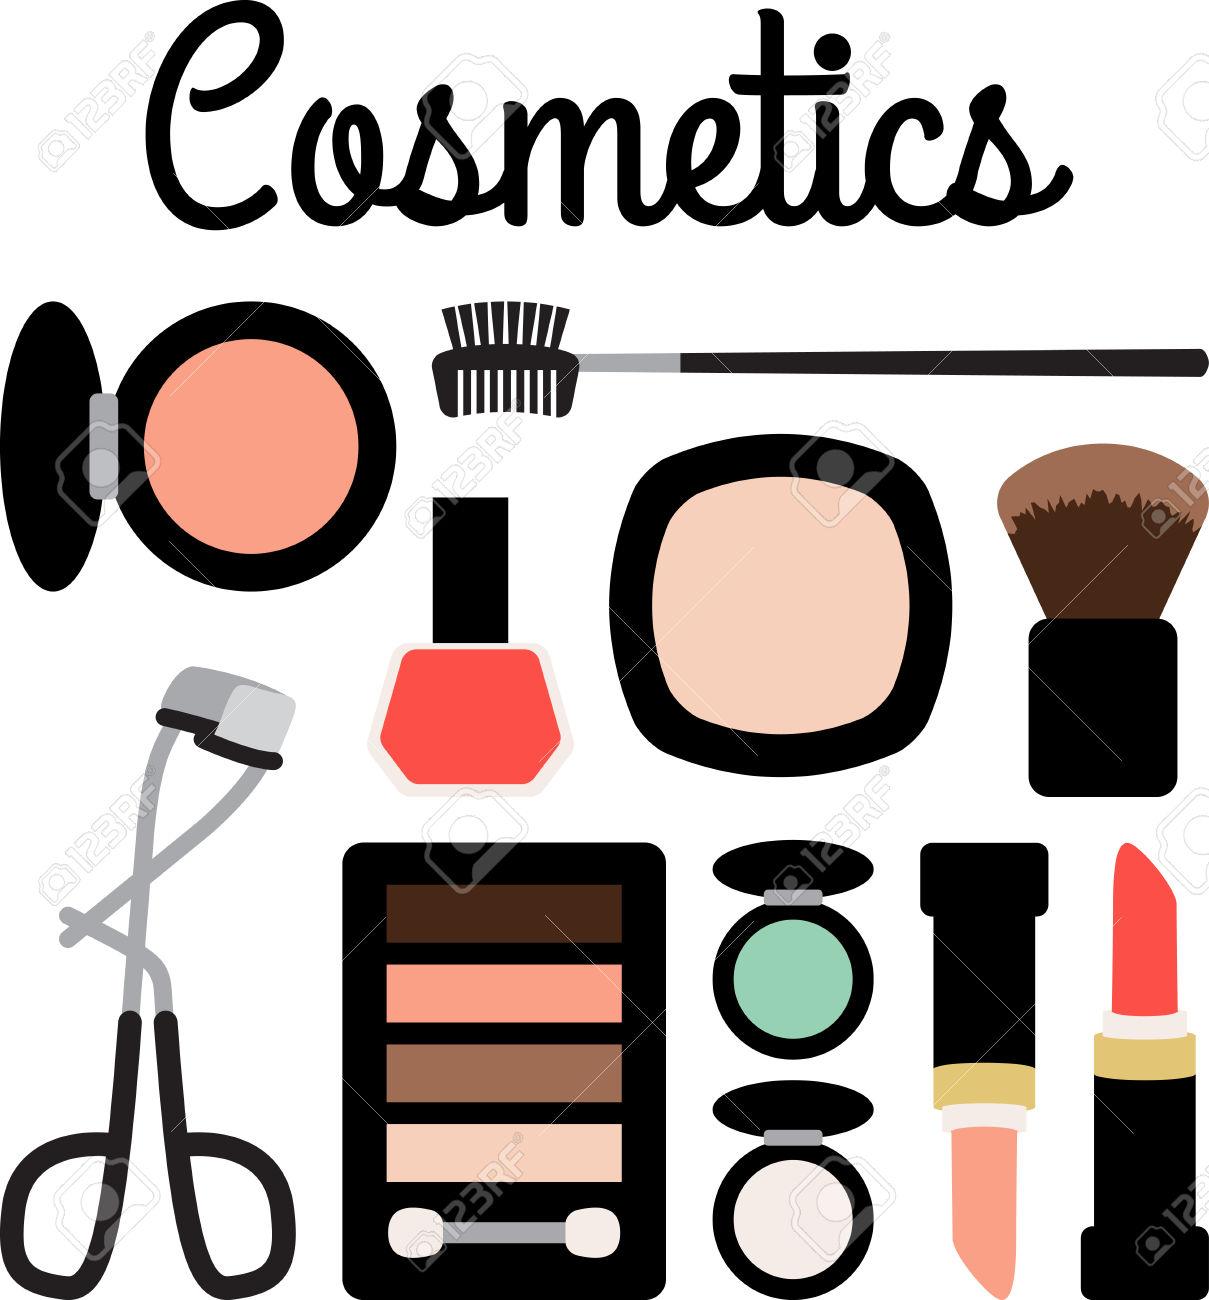 Beauty cosmetics clipart clip art free stock Cosmetics Clipart | Free download best Cosmetics Clipart on ... clip art free stock